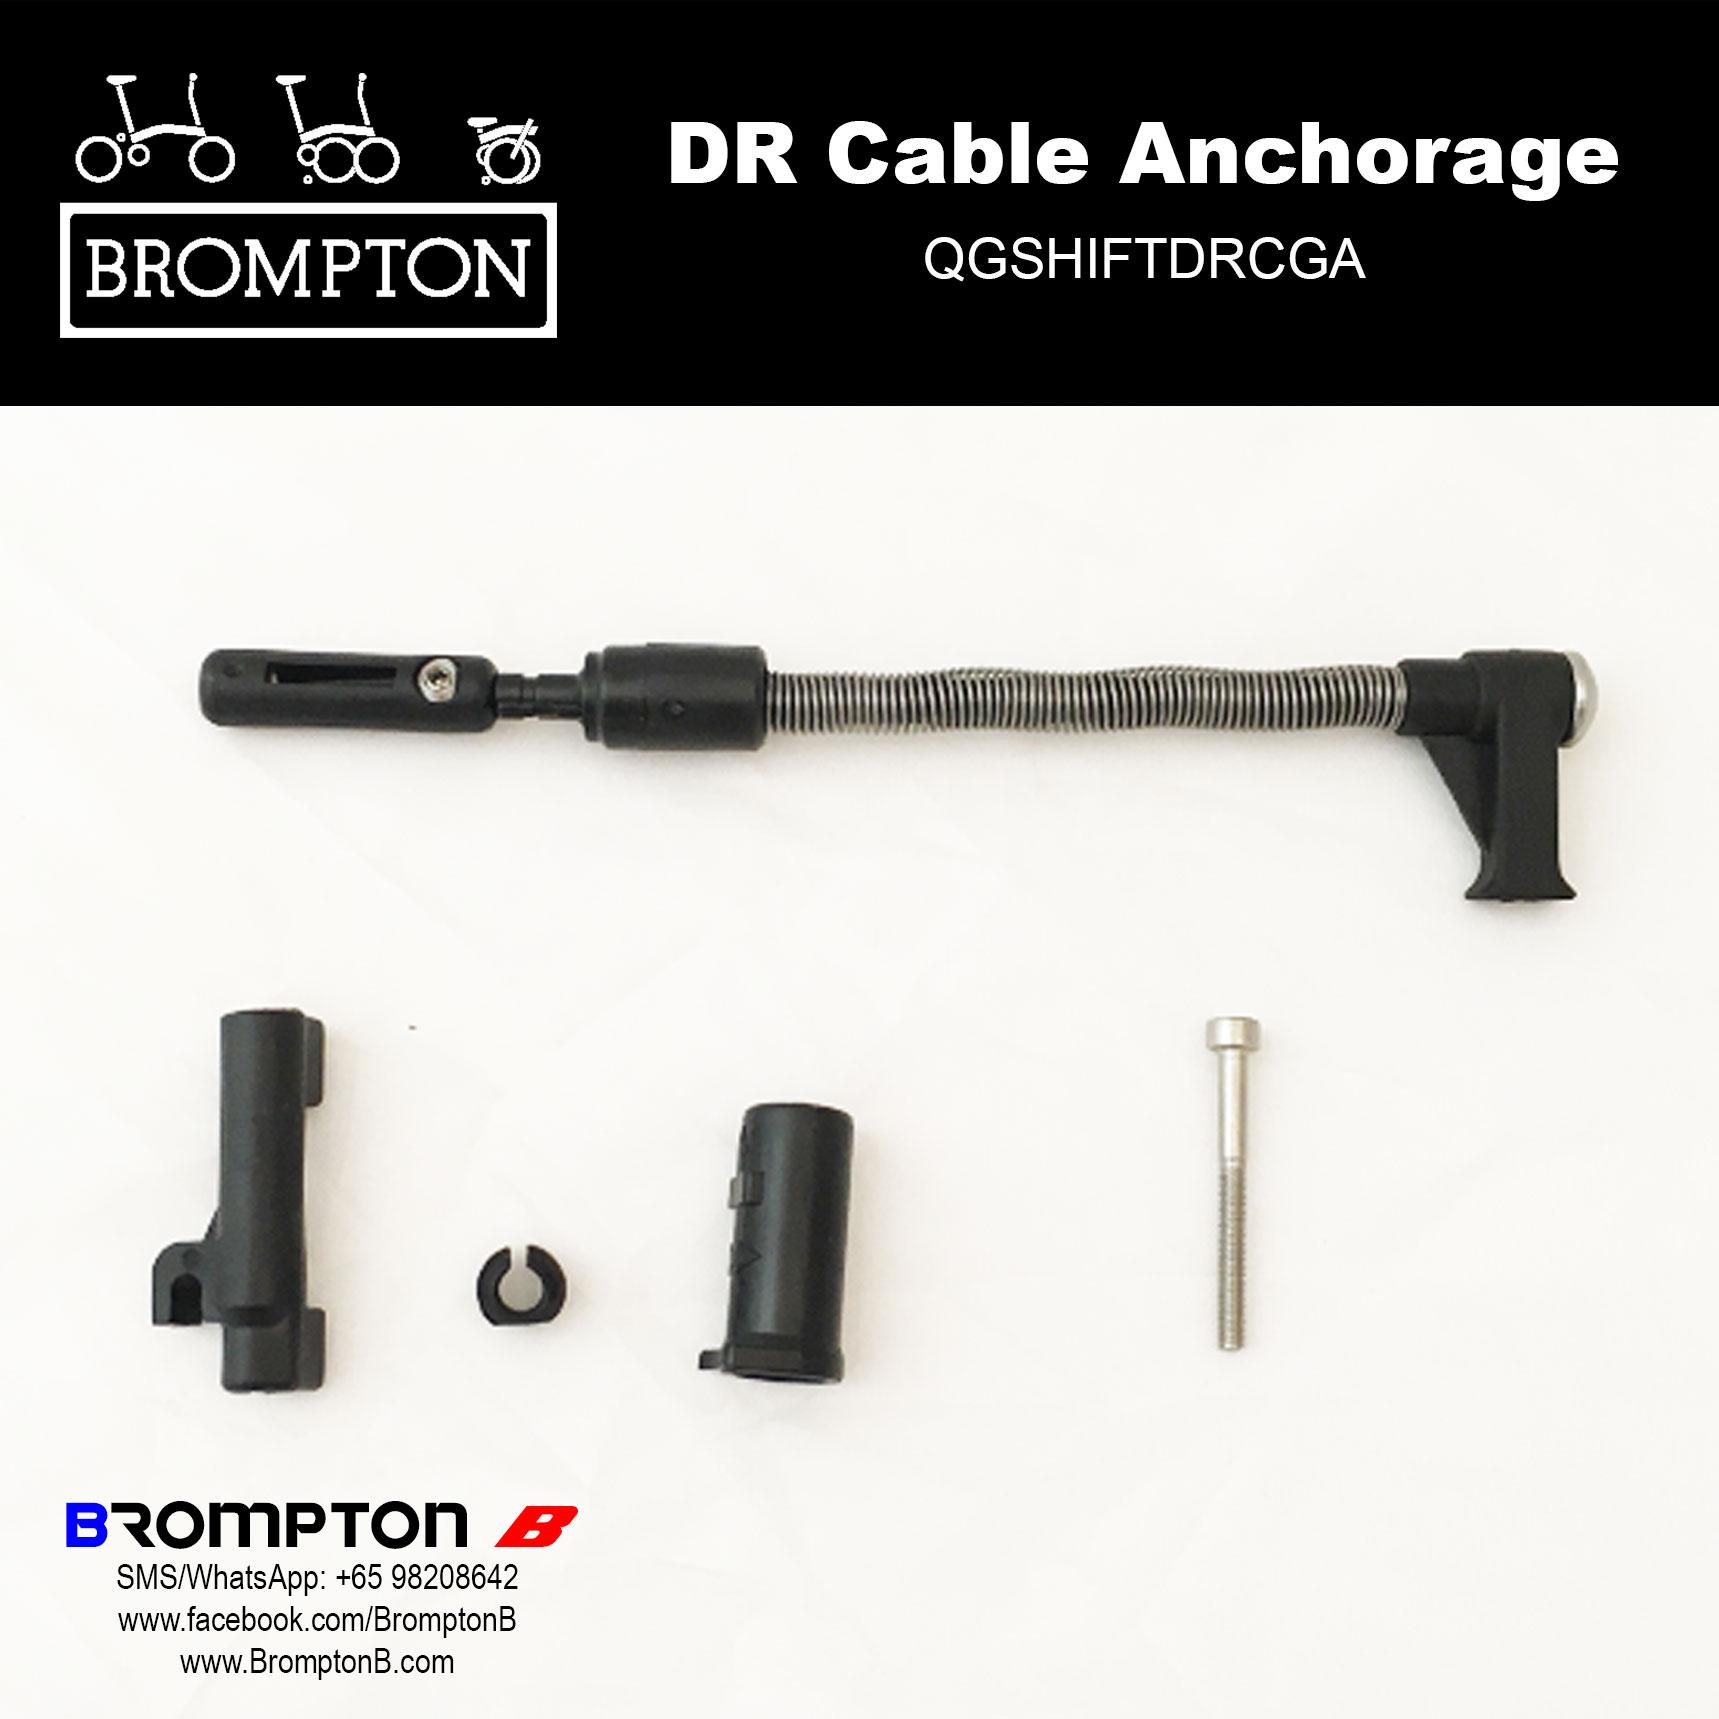 Brompton Deraileur Cable Anchorage Set 2017